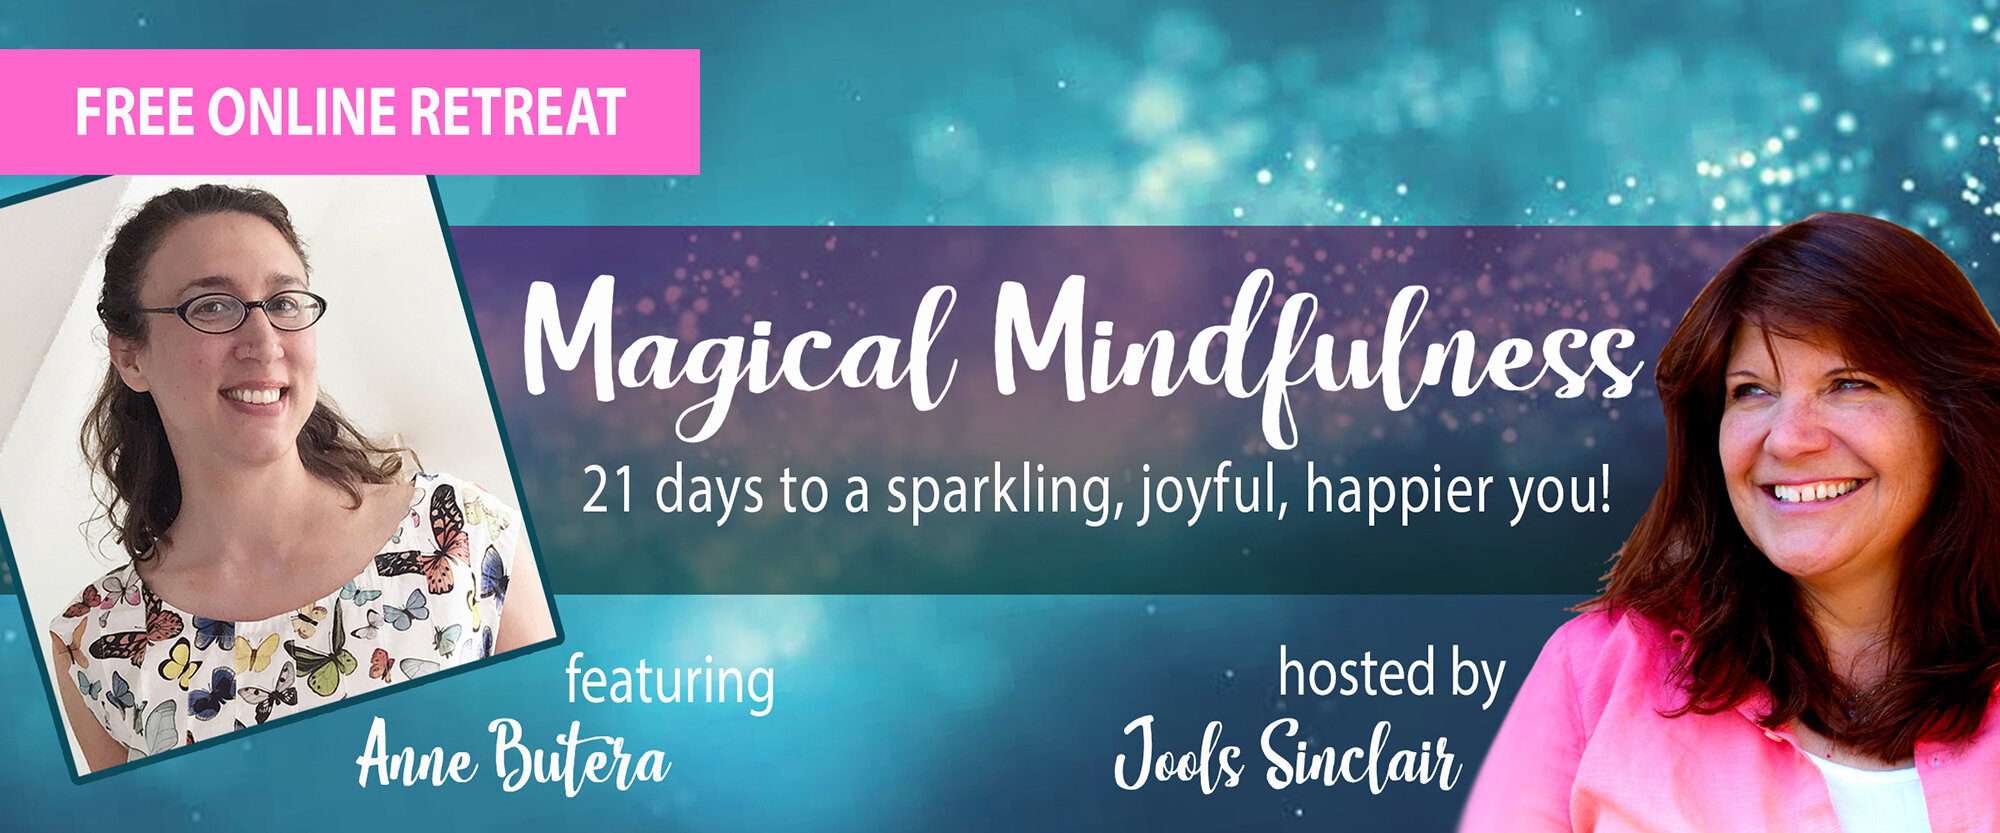 Magical Mindfulness online retreat featuring Anne Butera